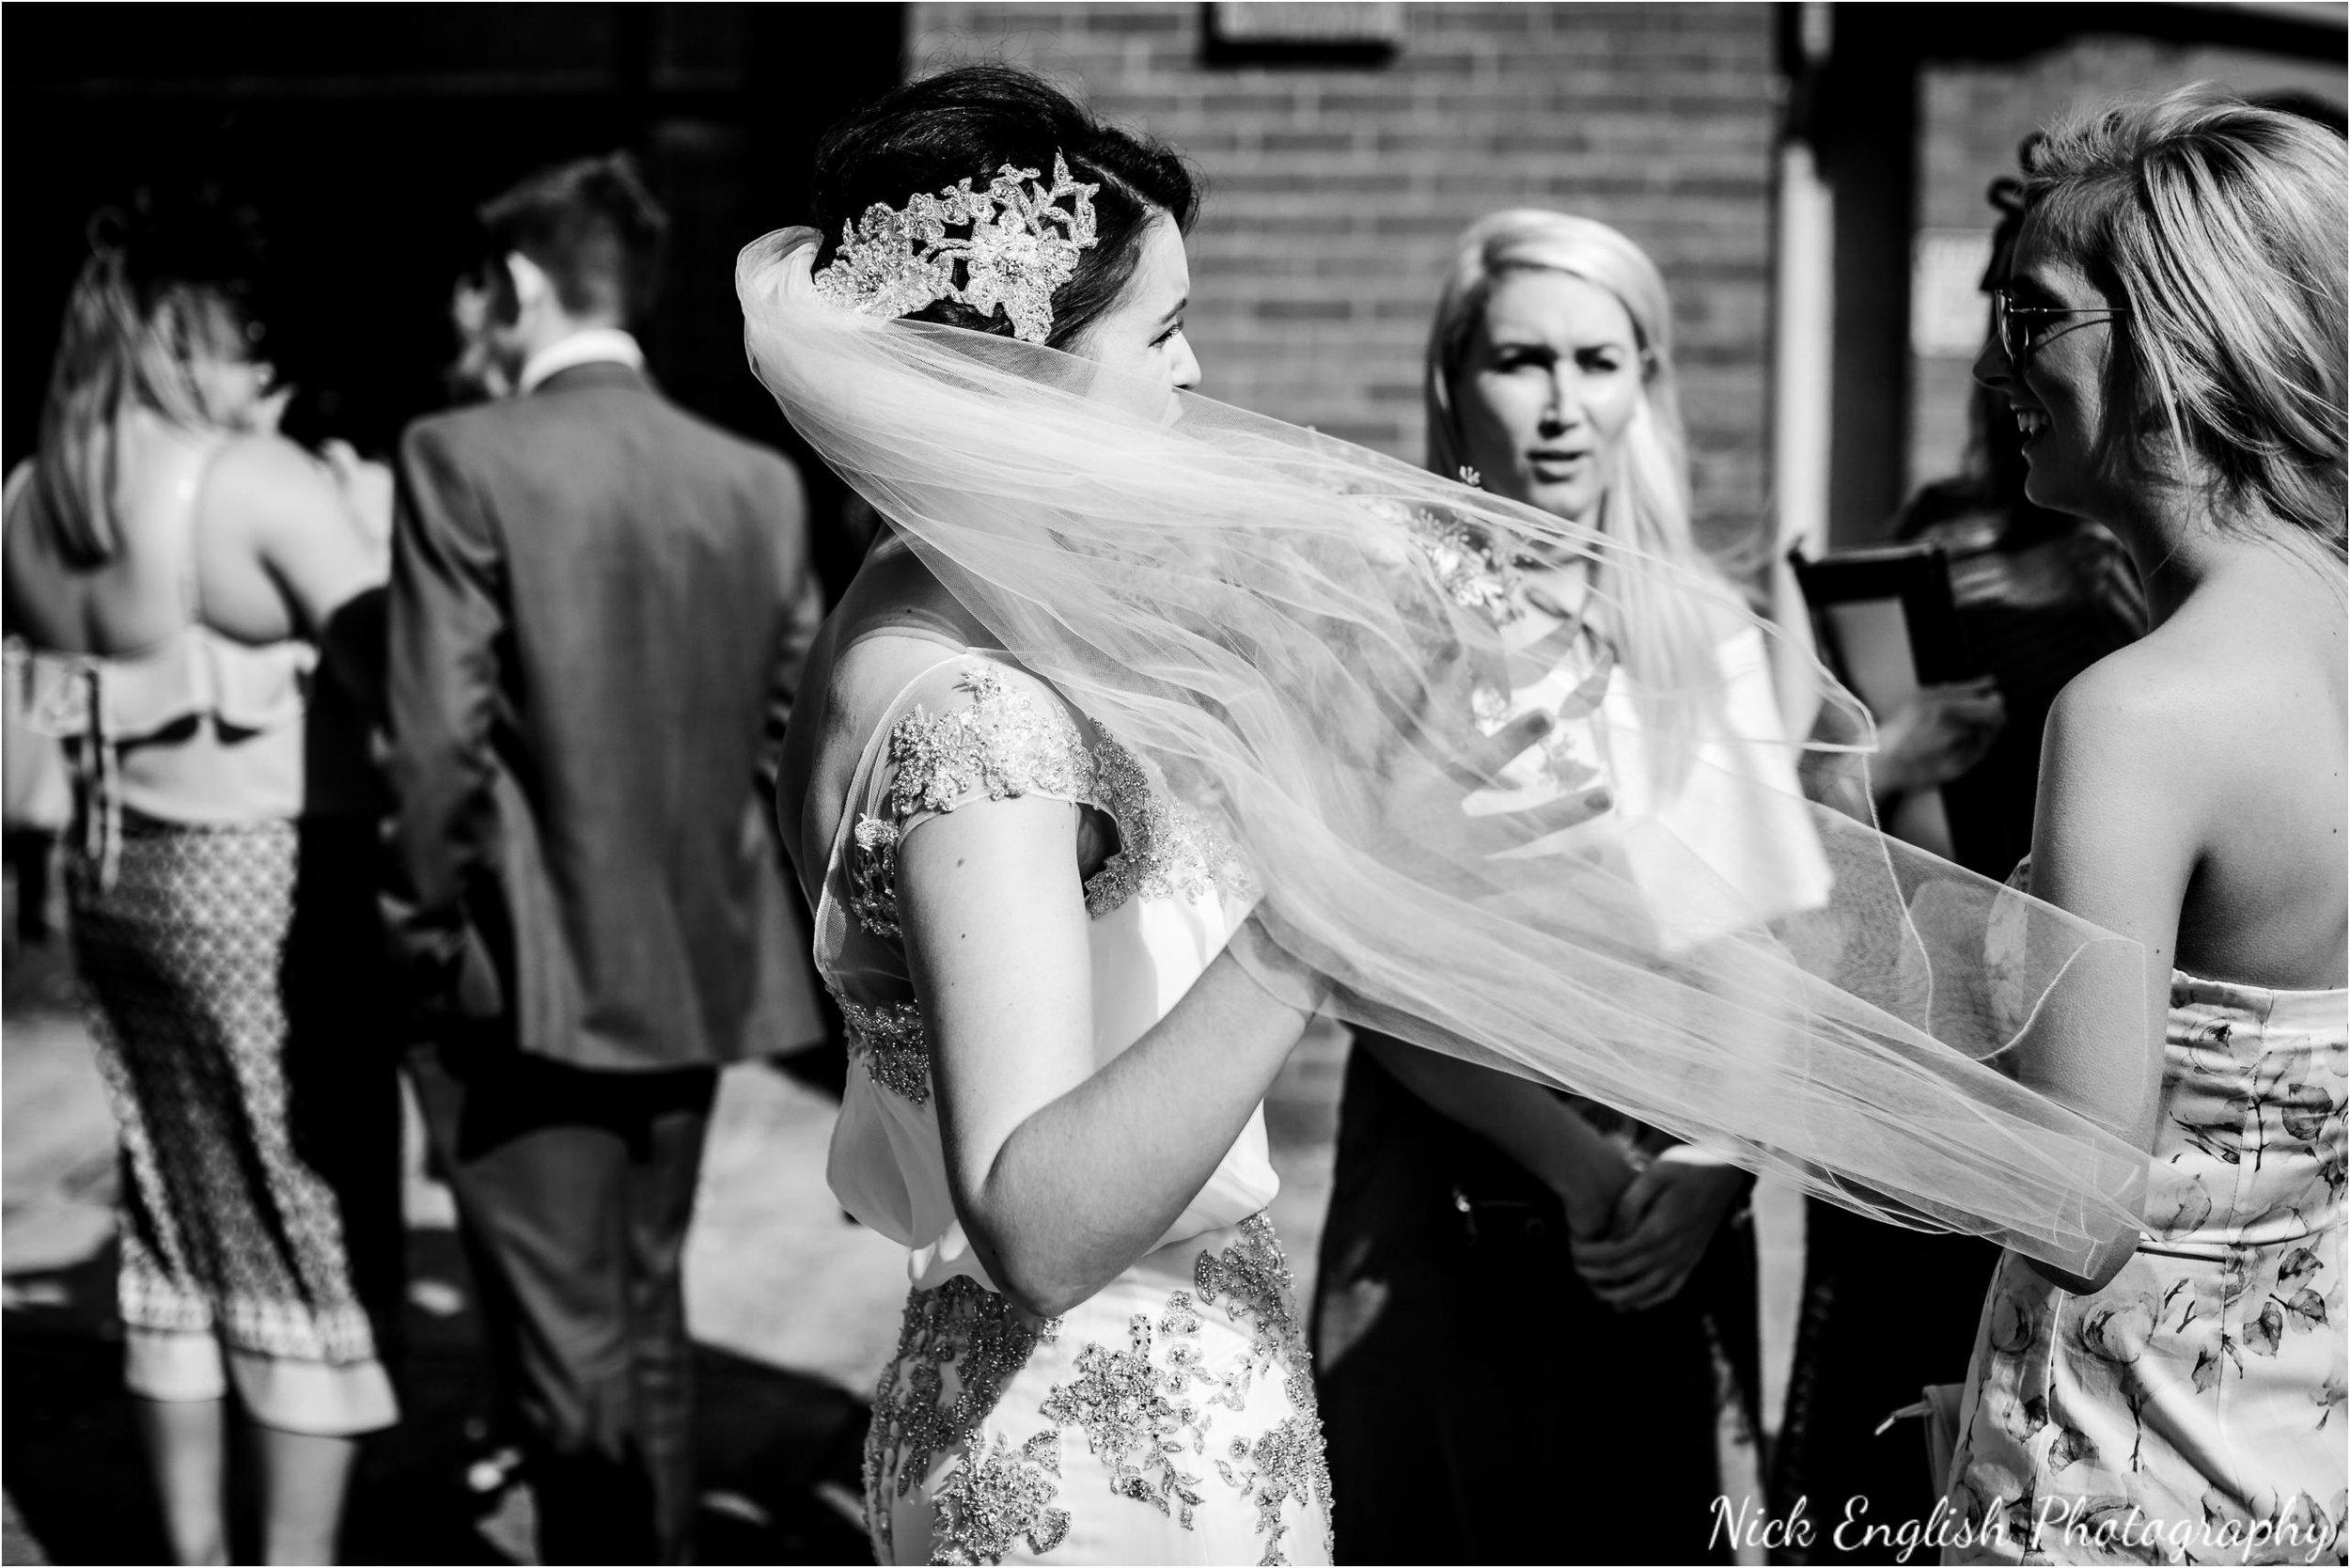 Stacey-Ash-Wedding-Photographs-Stanley-House-Preston-Lancashire-97.jpg